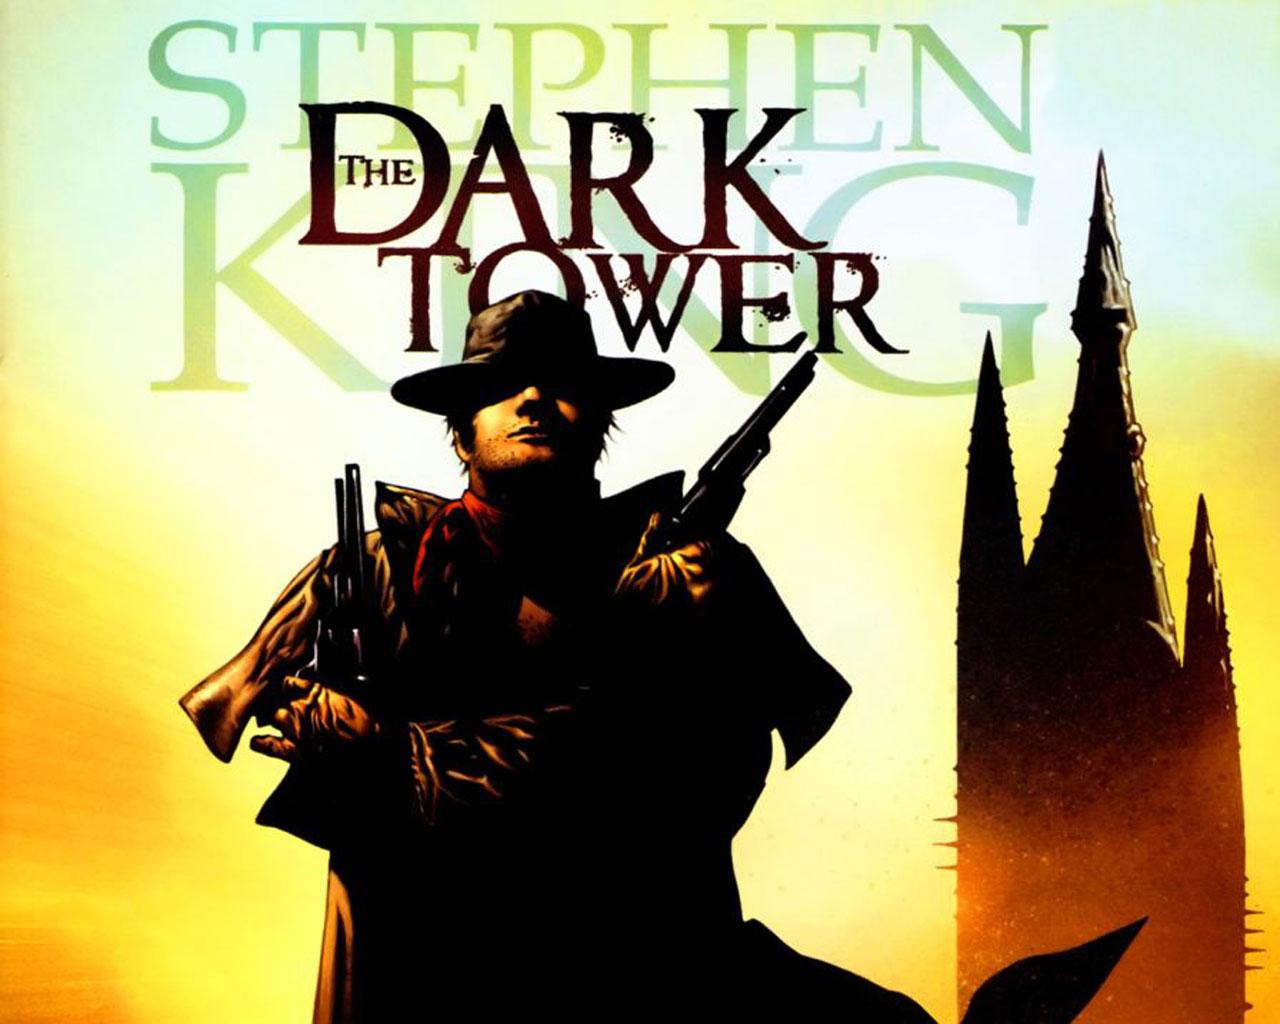 http://3.bp.blogspot.com/_4fr4MKI1RVA/TUFFnZoWrZI/AAAAAAAAAV0/yq61IowPWb8/s1600/Dark-Tower-1876.jpg